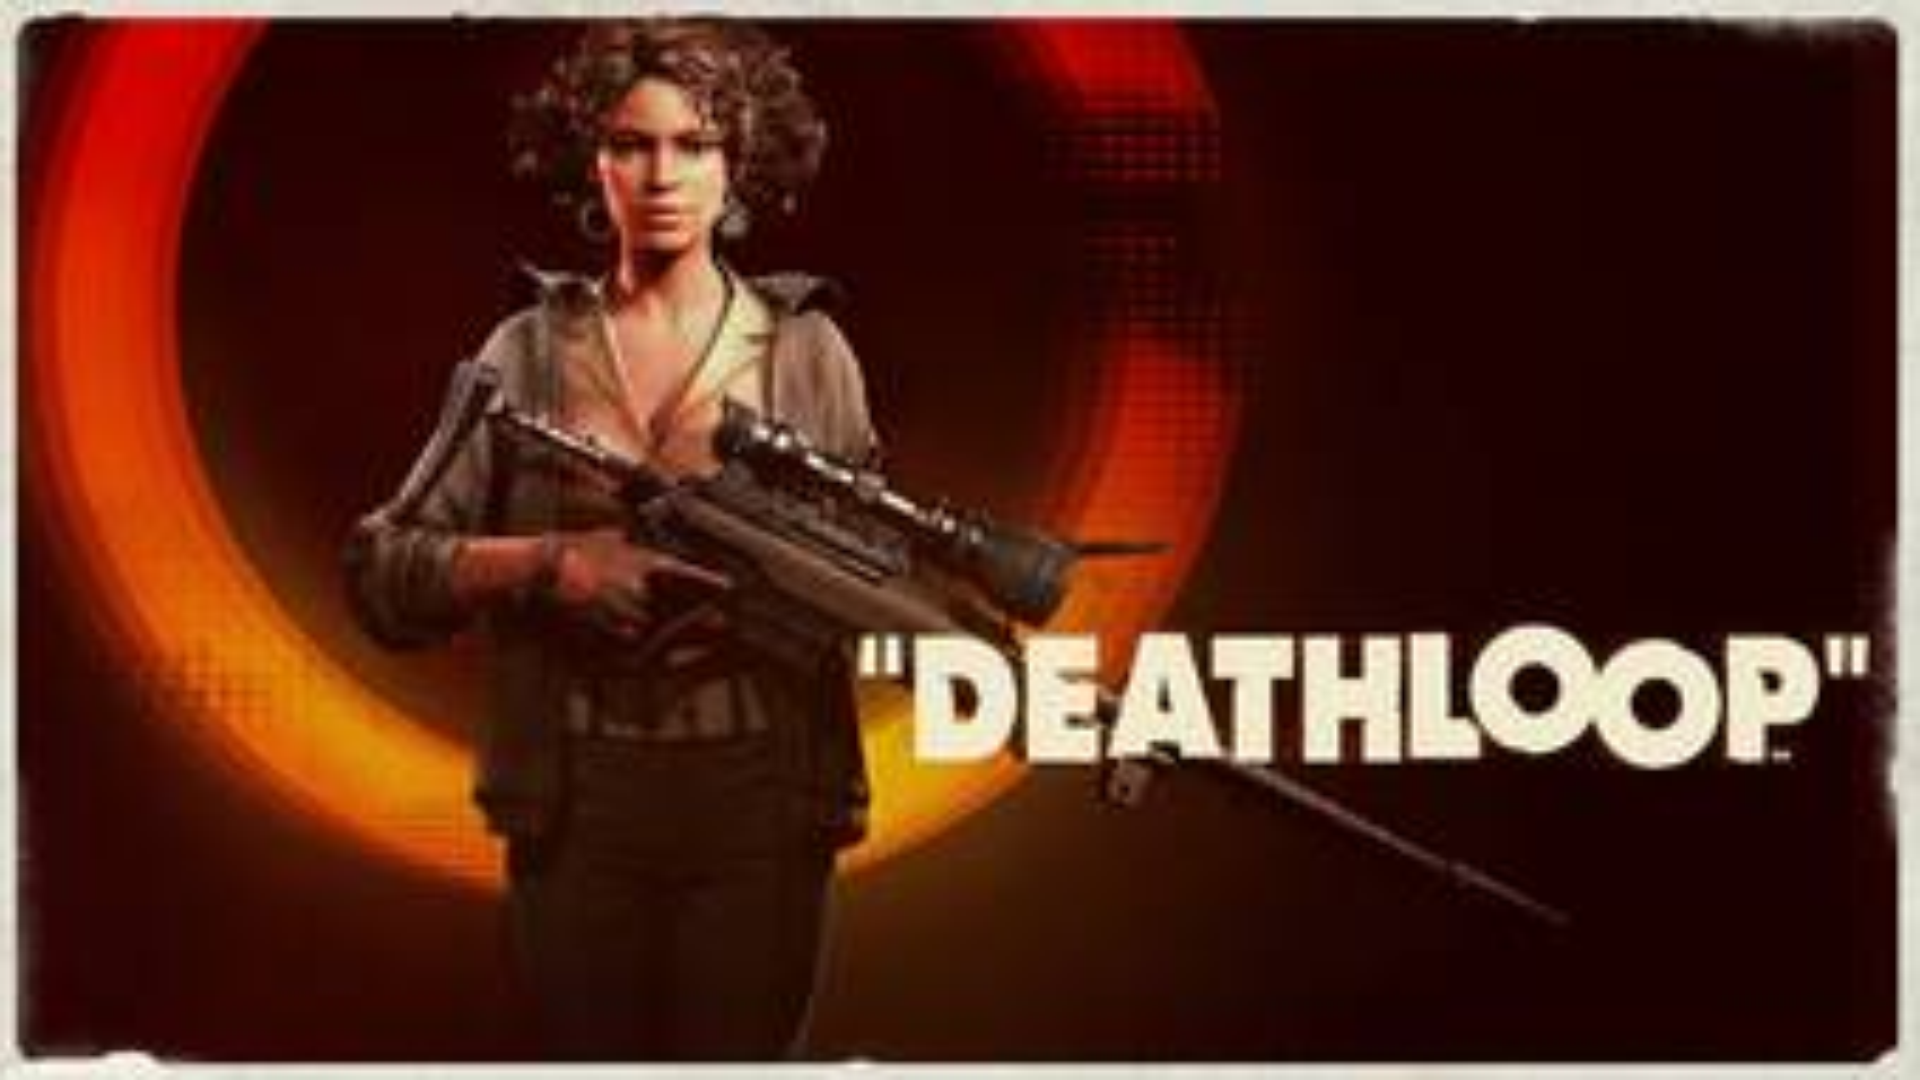 Image for Top 7 games releasing in September - Deathloop, WarioWare, and more